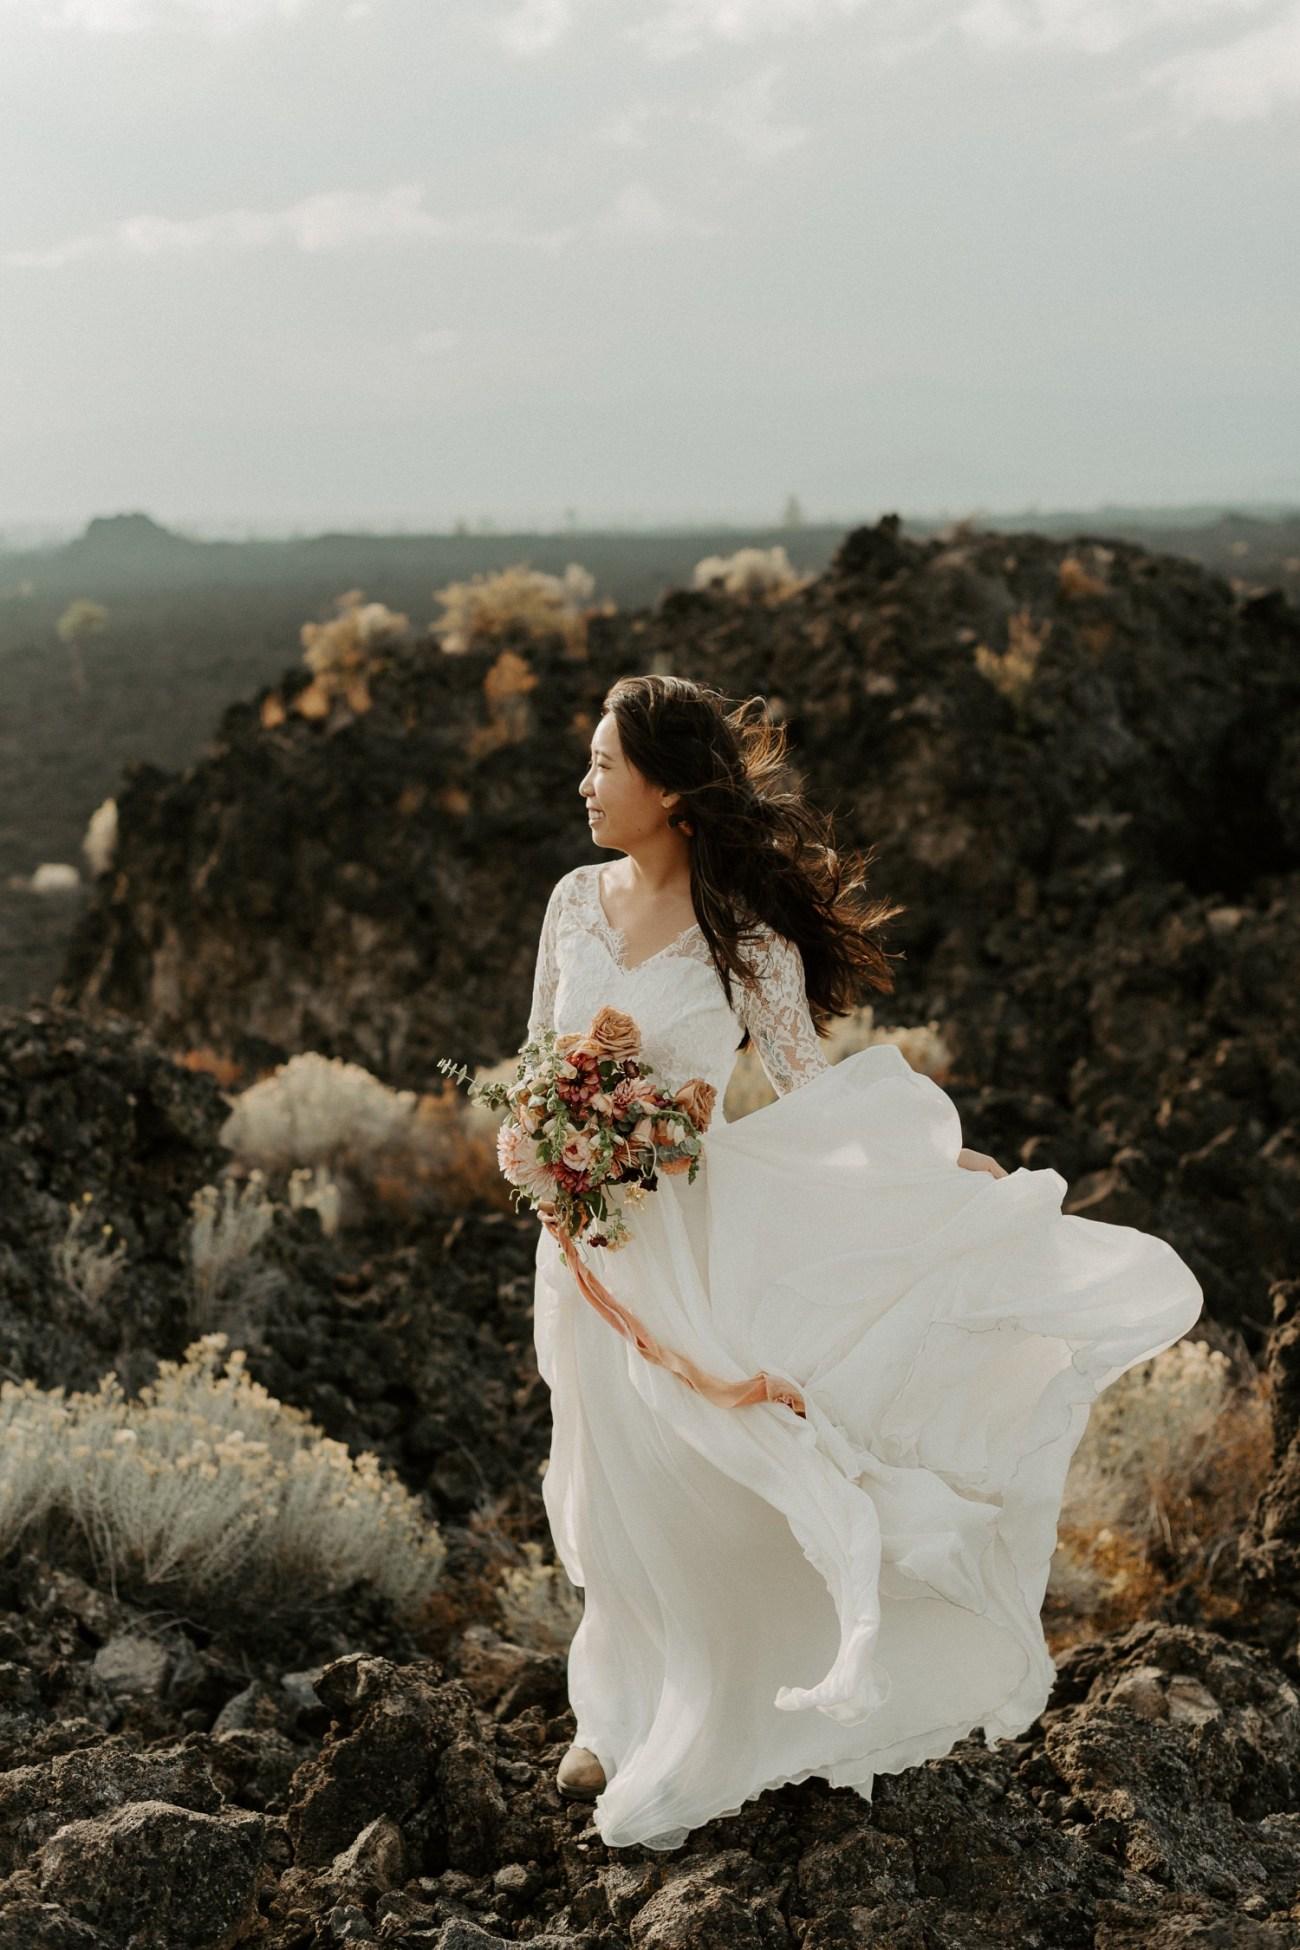 Newberry Volcano Elopement Bend Elopement Bridal Session Bend Wedding Photographer Anais Possamai Photography 027